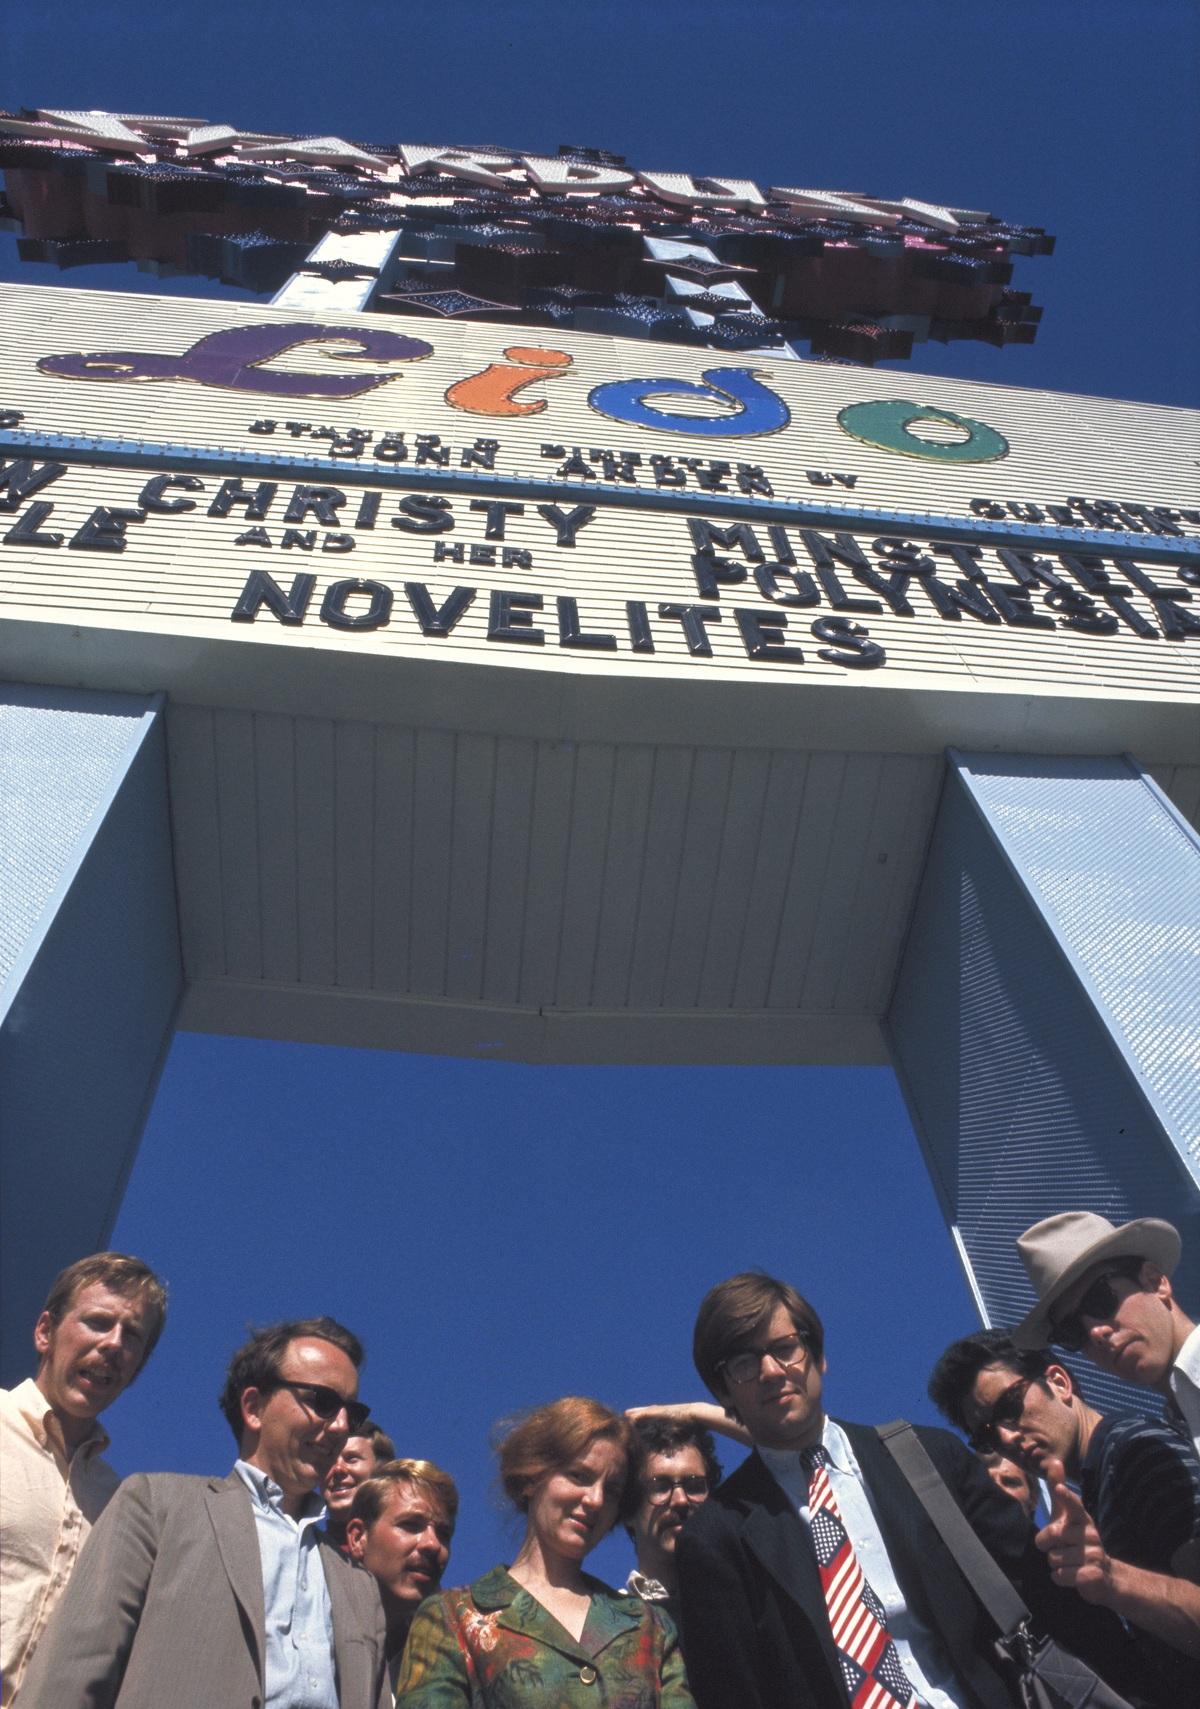 Studio members at the Stardust. Credit: Venturi, Scott Brown and Associates, Inc.